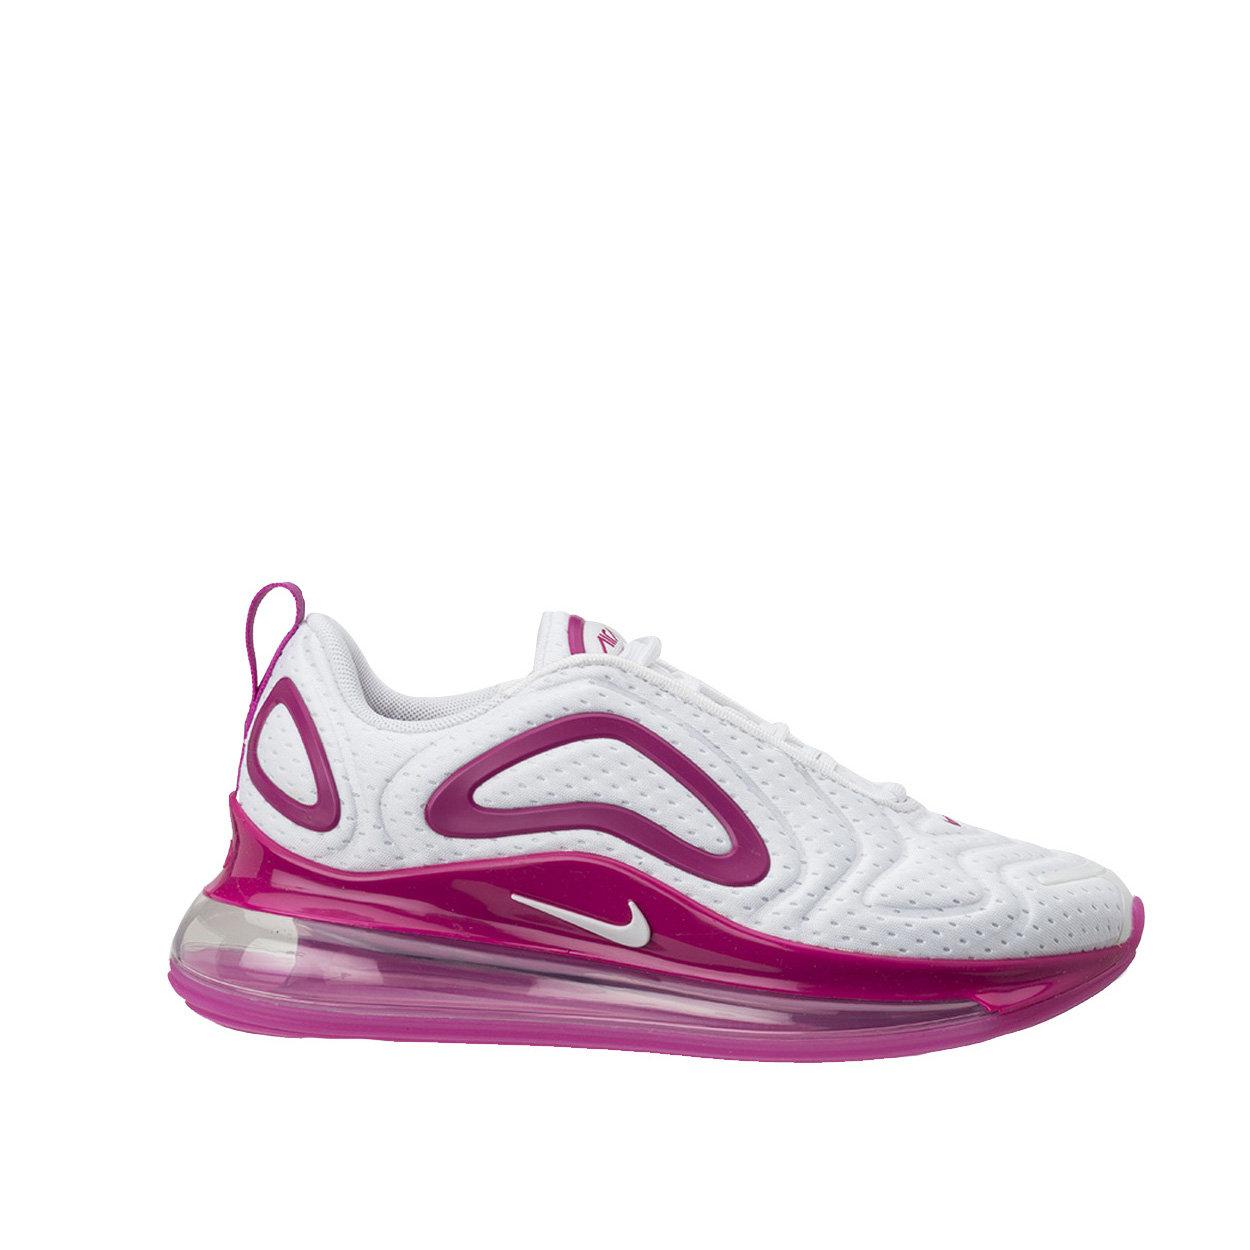 Sneakers Nike Air Max 720 bianche e fucsia